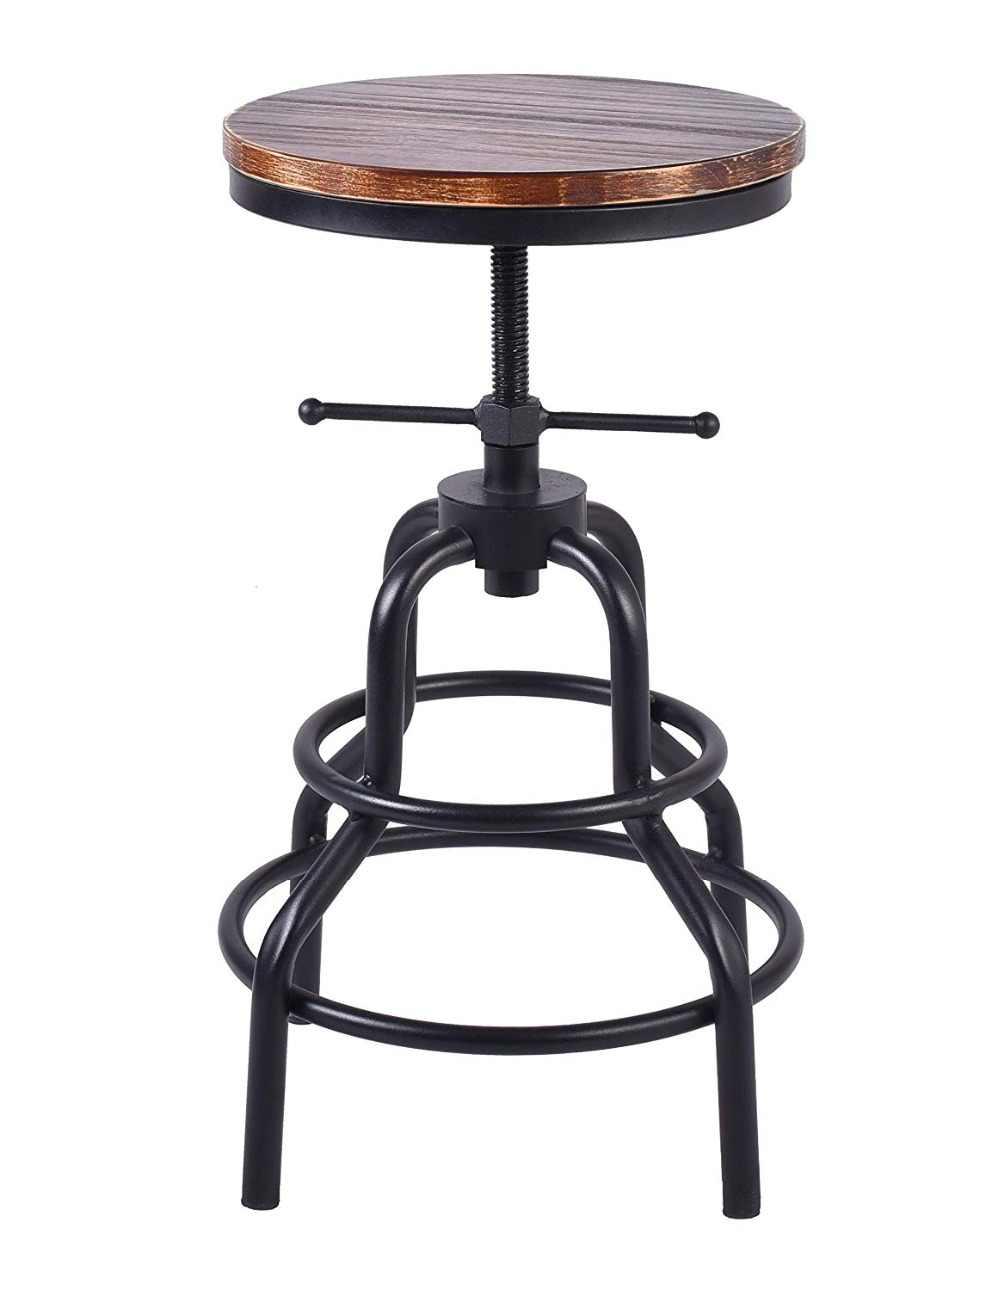 Vintage Industrie Barhocker Mansard Einstellbare Hohe Swivel Barhocker Mit Kiefer Holz Bar Stuhl Metall Schwarz Stuhl Bar Stuhlen Aliexpress